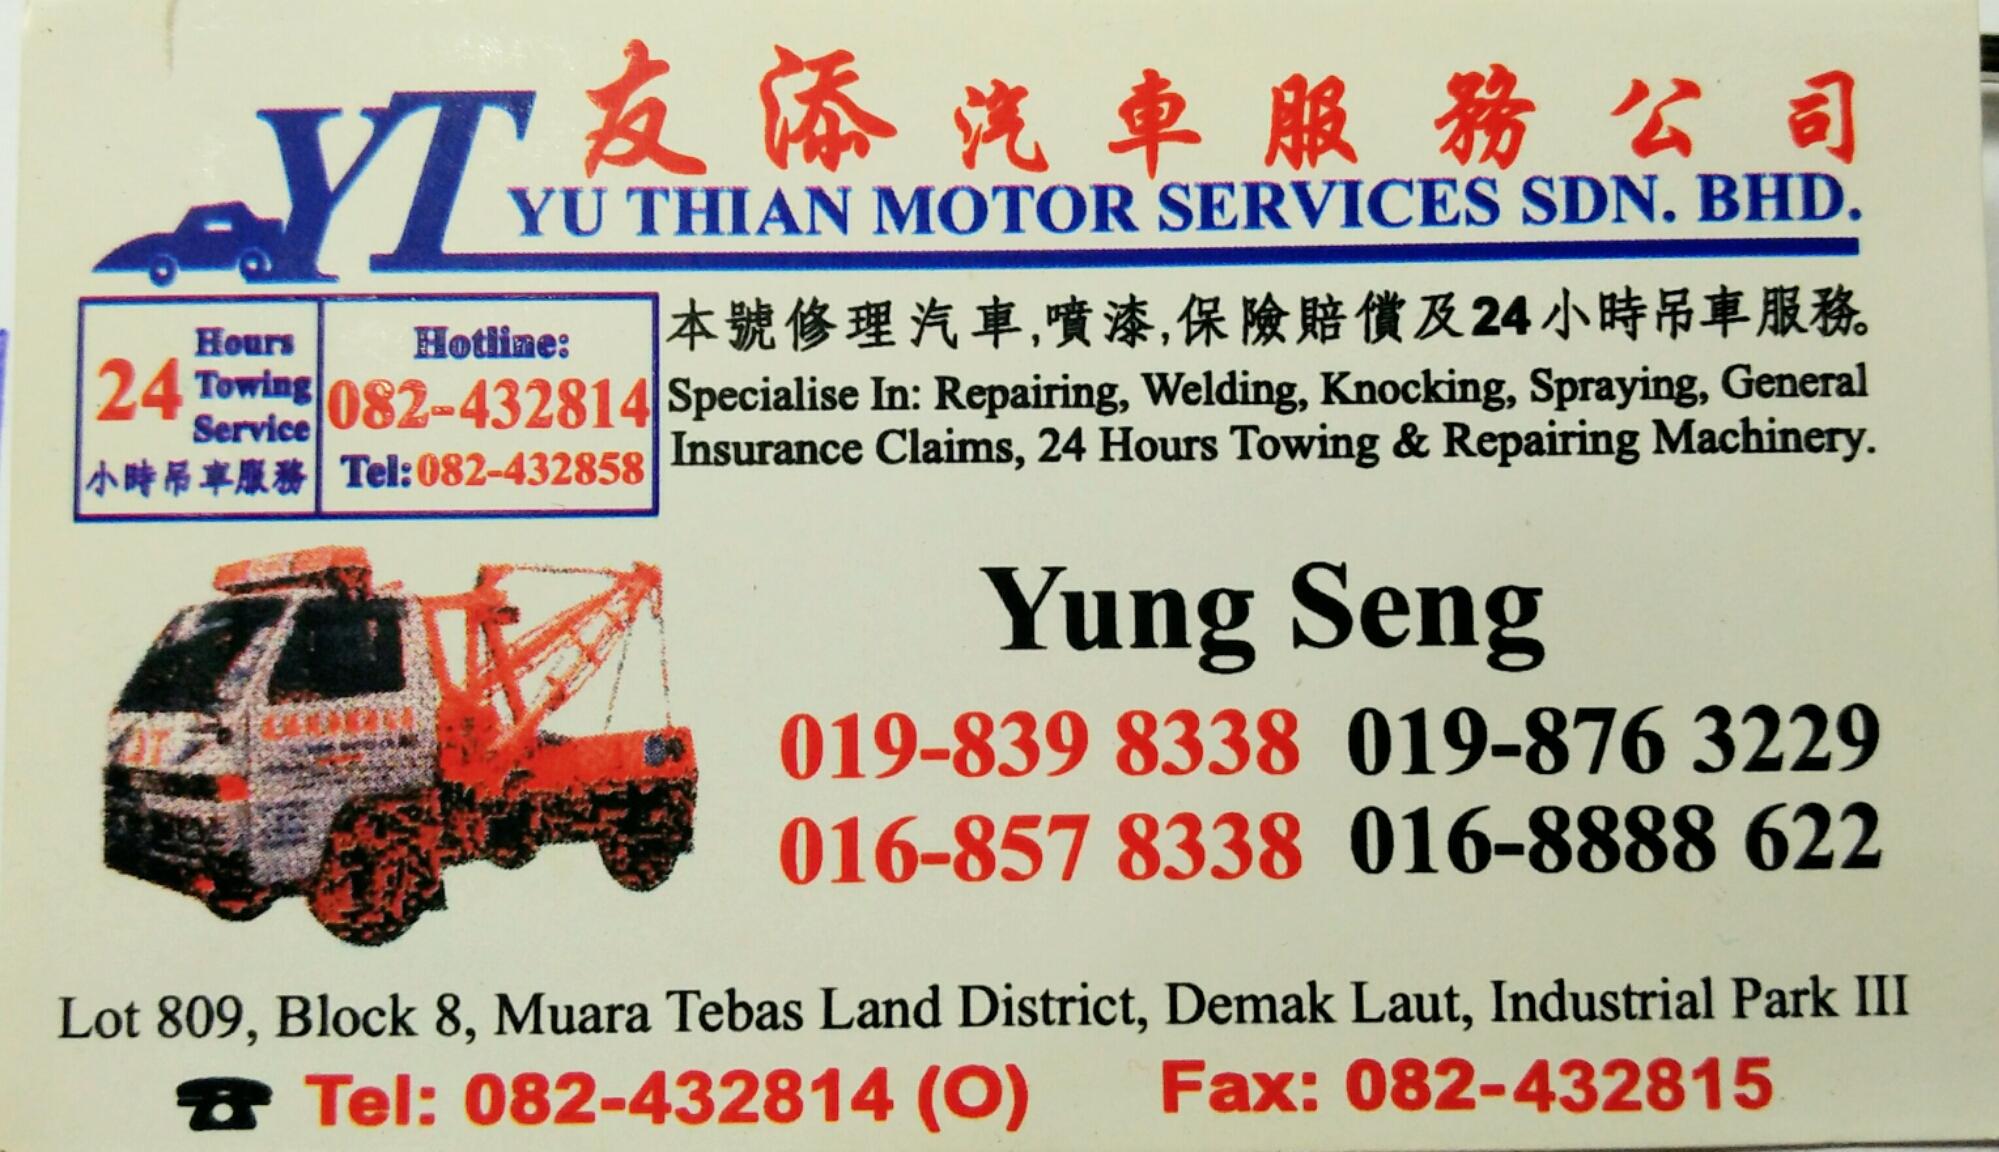 Yu Thian Motor Services Sdn. Bhd.